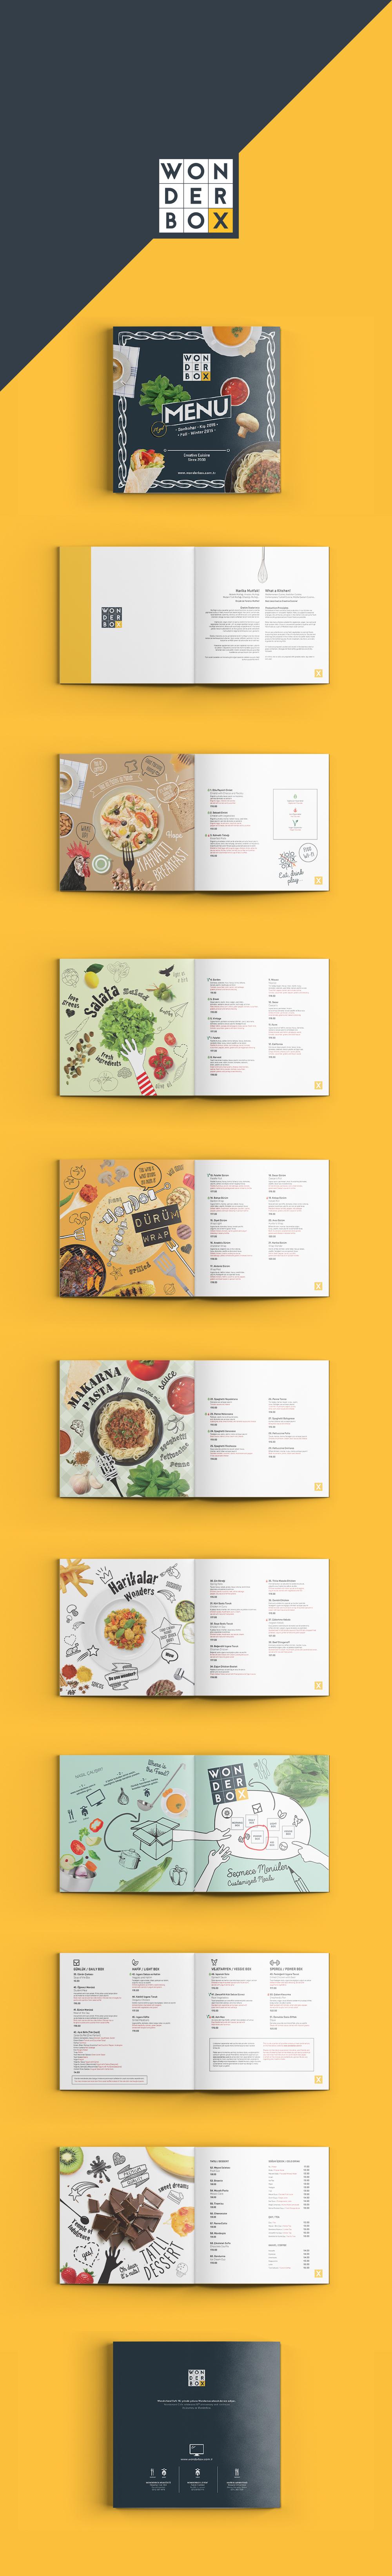 wonderbox creative cuisine menu on behance. Black Bedroom Furniture Sets. Home Design Ideas